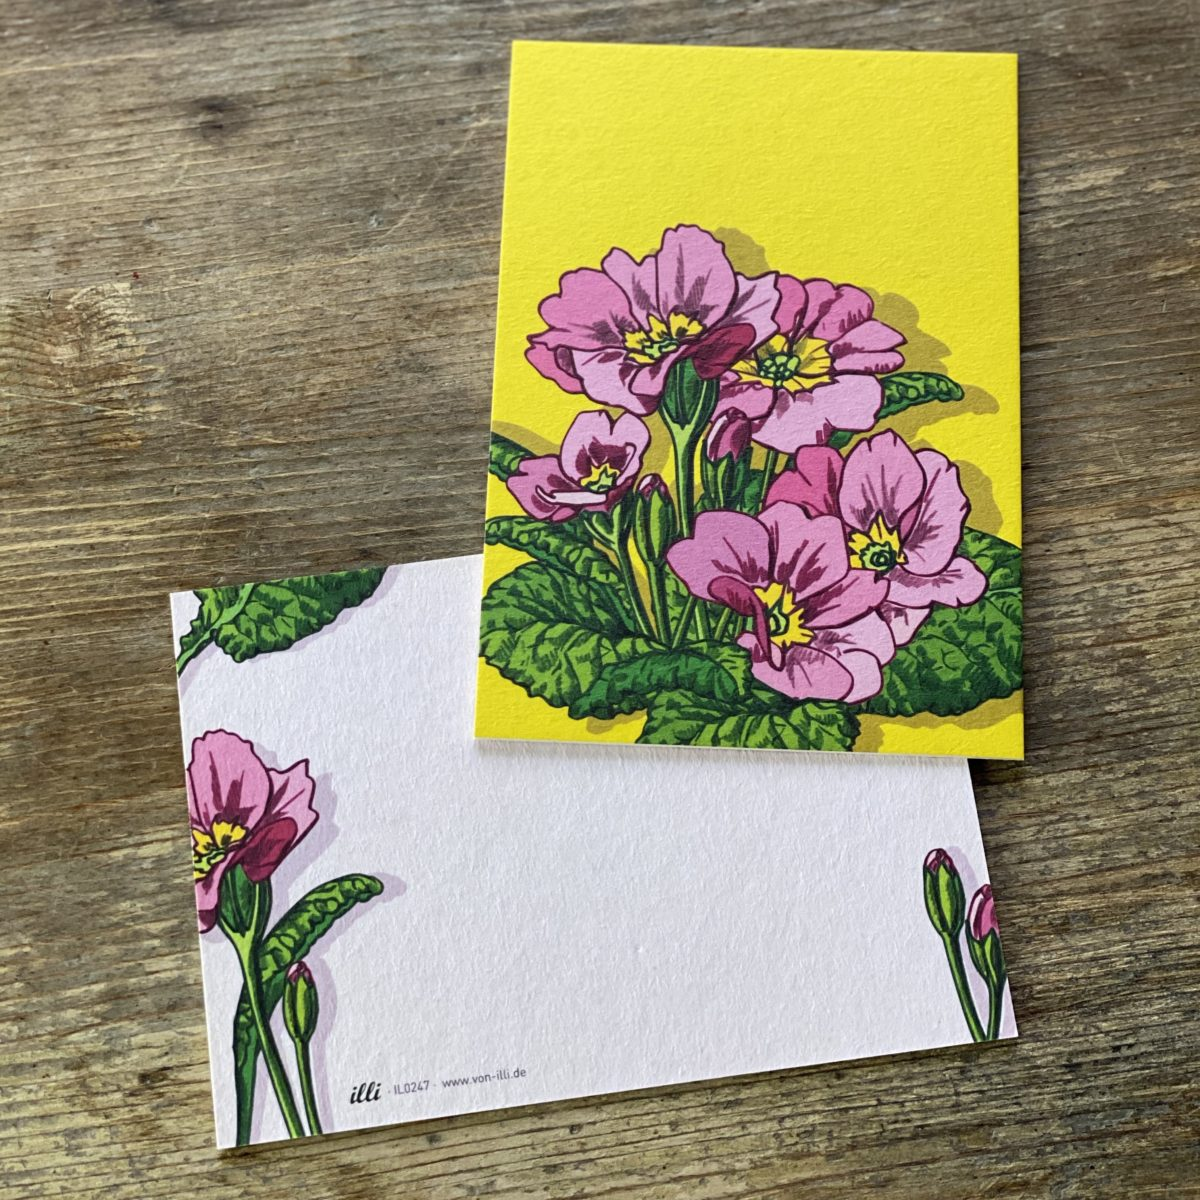 KYUTE Postkarte von illi PRIMULA PINK